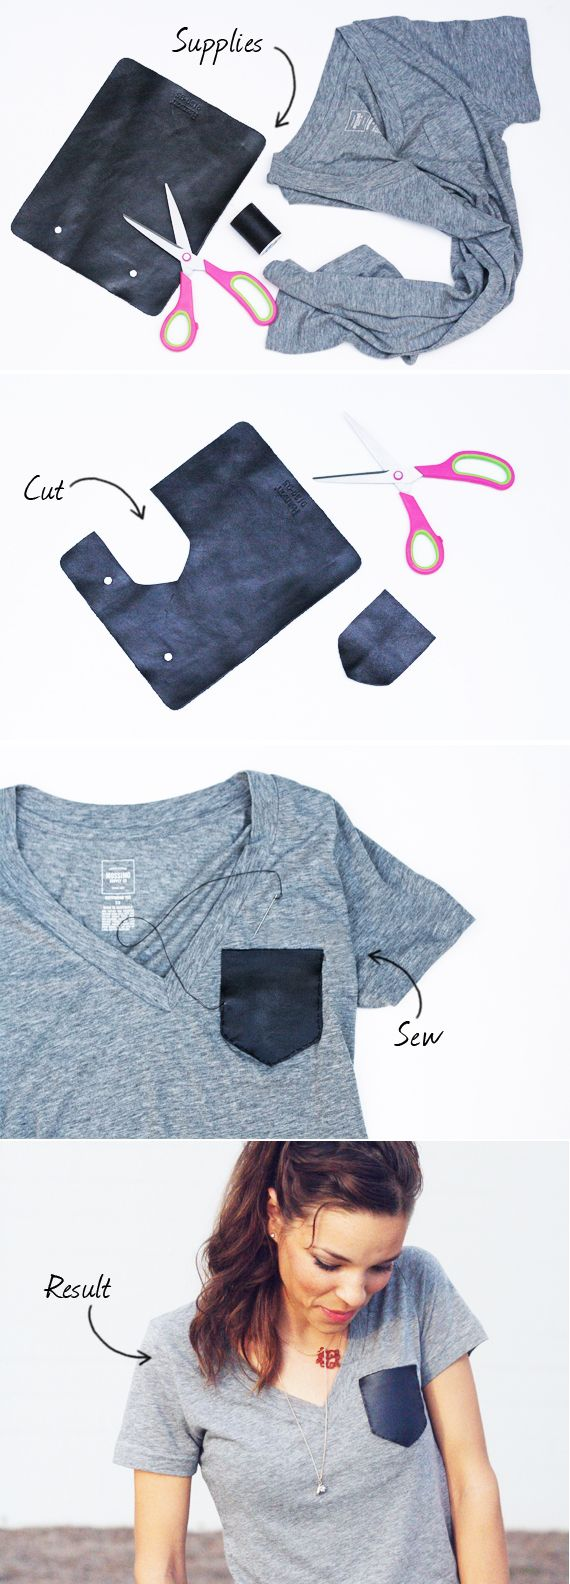 diy leather pocket tee - camiseta con bolsillo de algodon